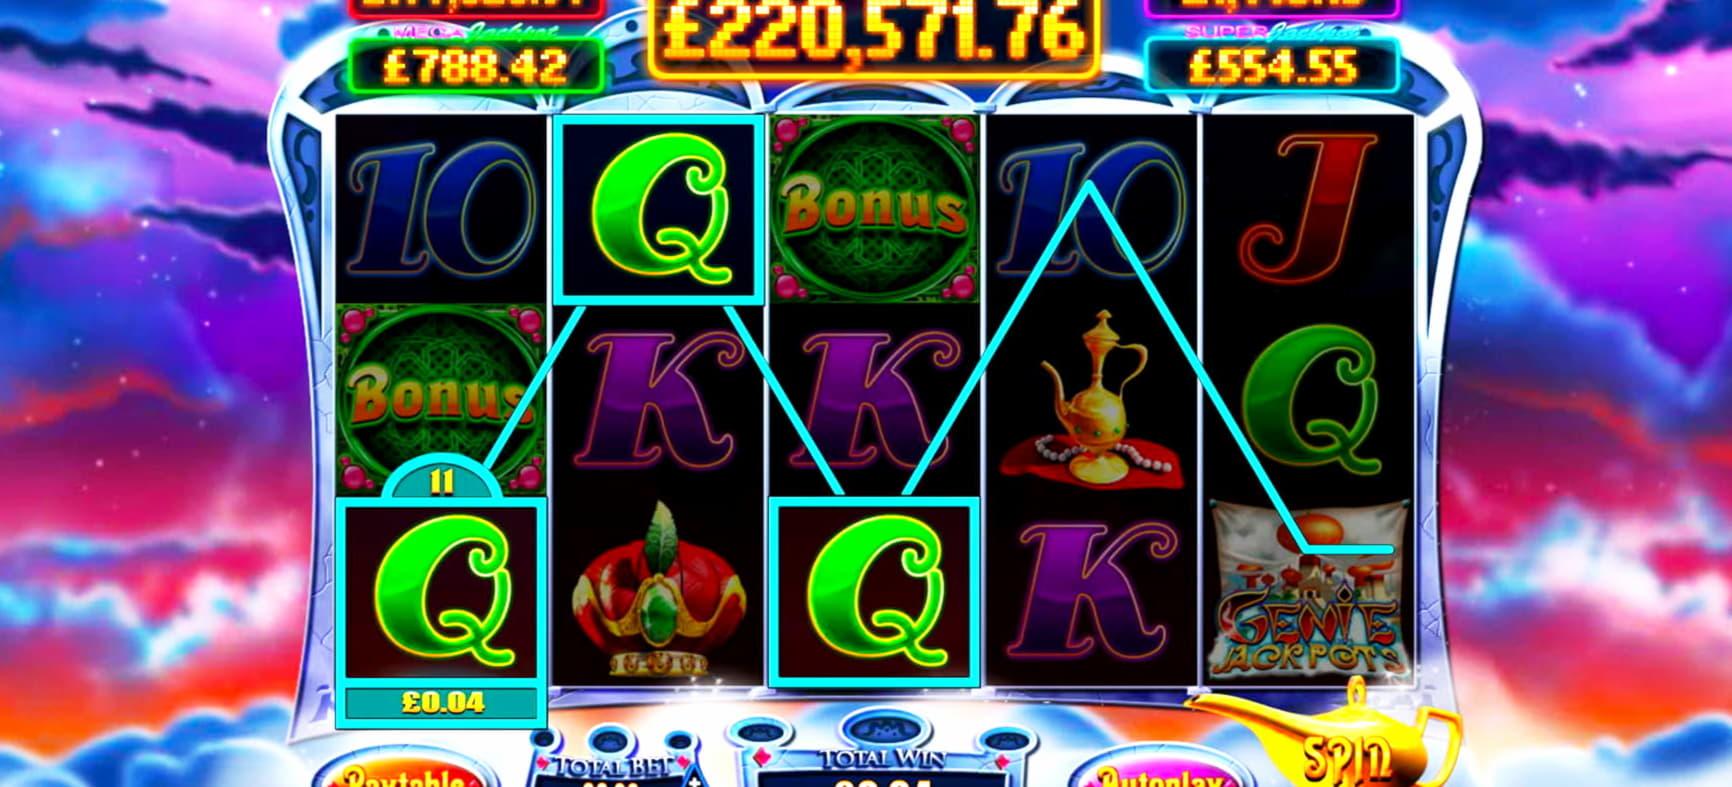 €790 Casino tournaments freeroll at Ruby Fortune Casino